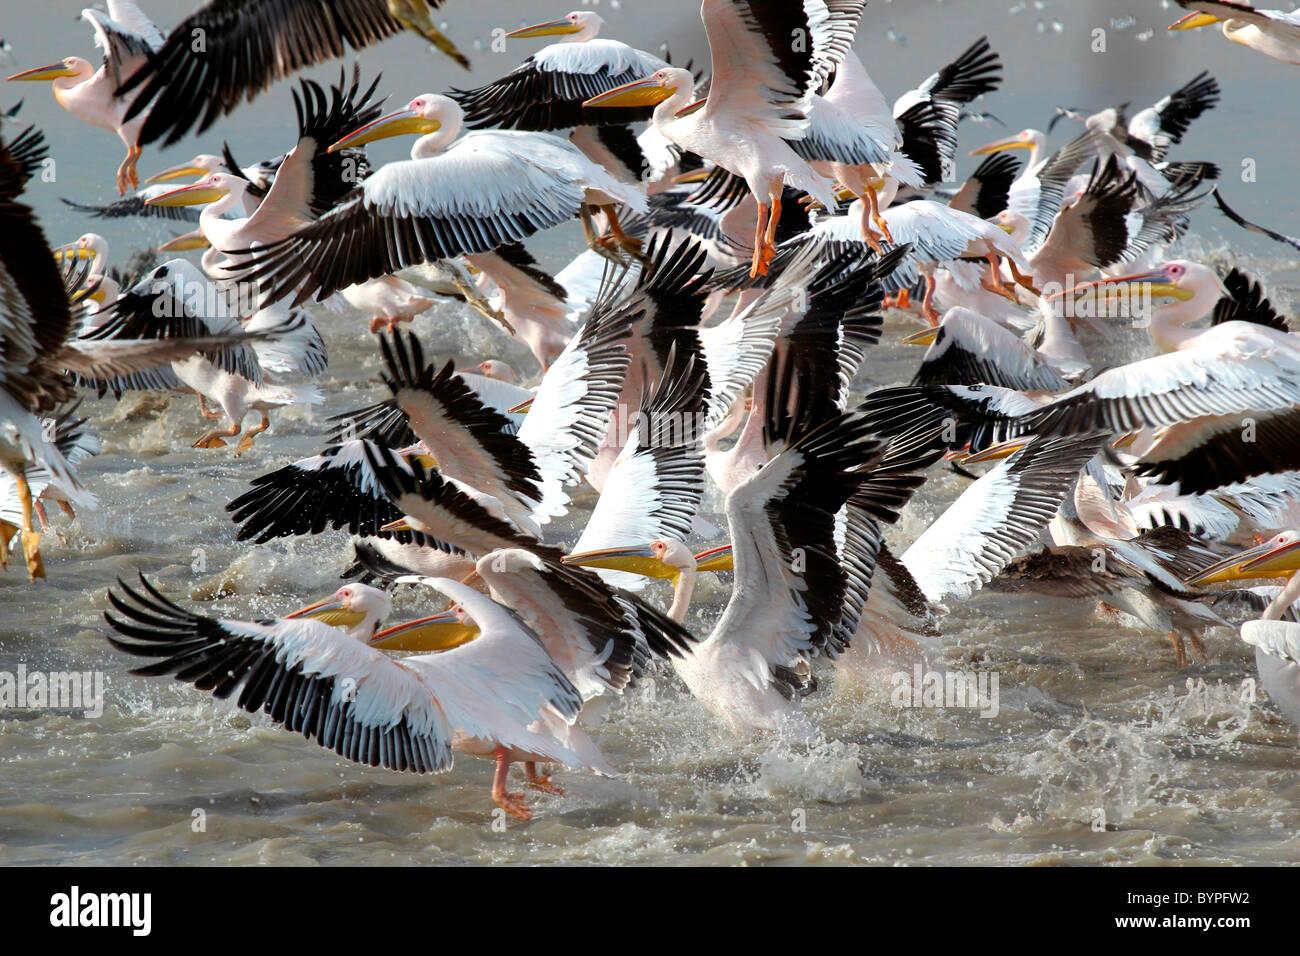 Ein Groupf der Rosapelikan (Pelecanus Onocrotalus) Vögel in Rann Of Kutch, Gujarat, Indien Stockbild